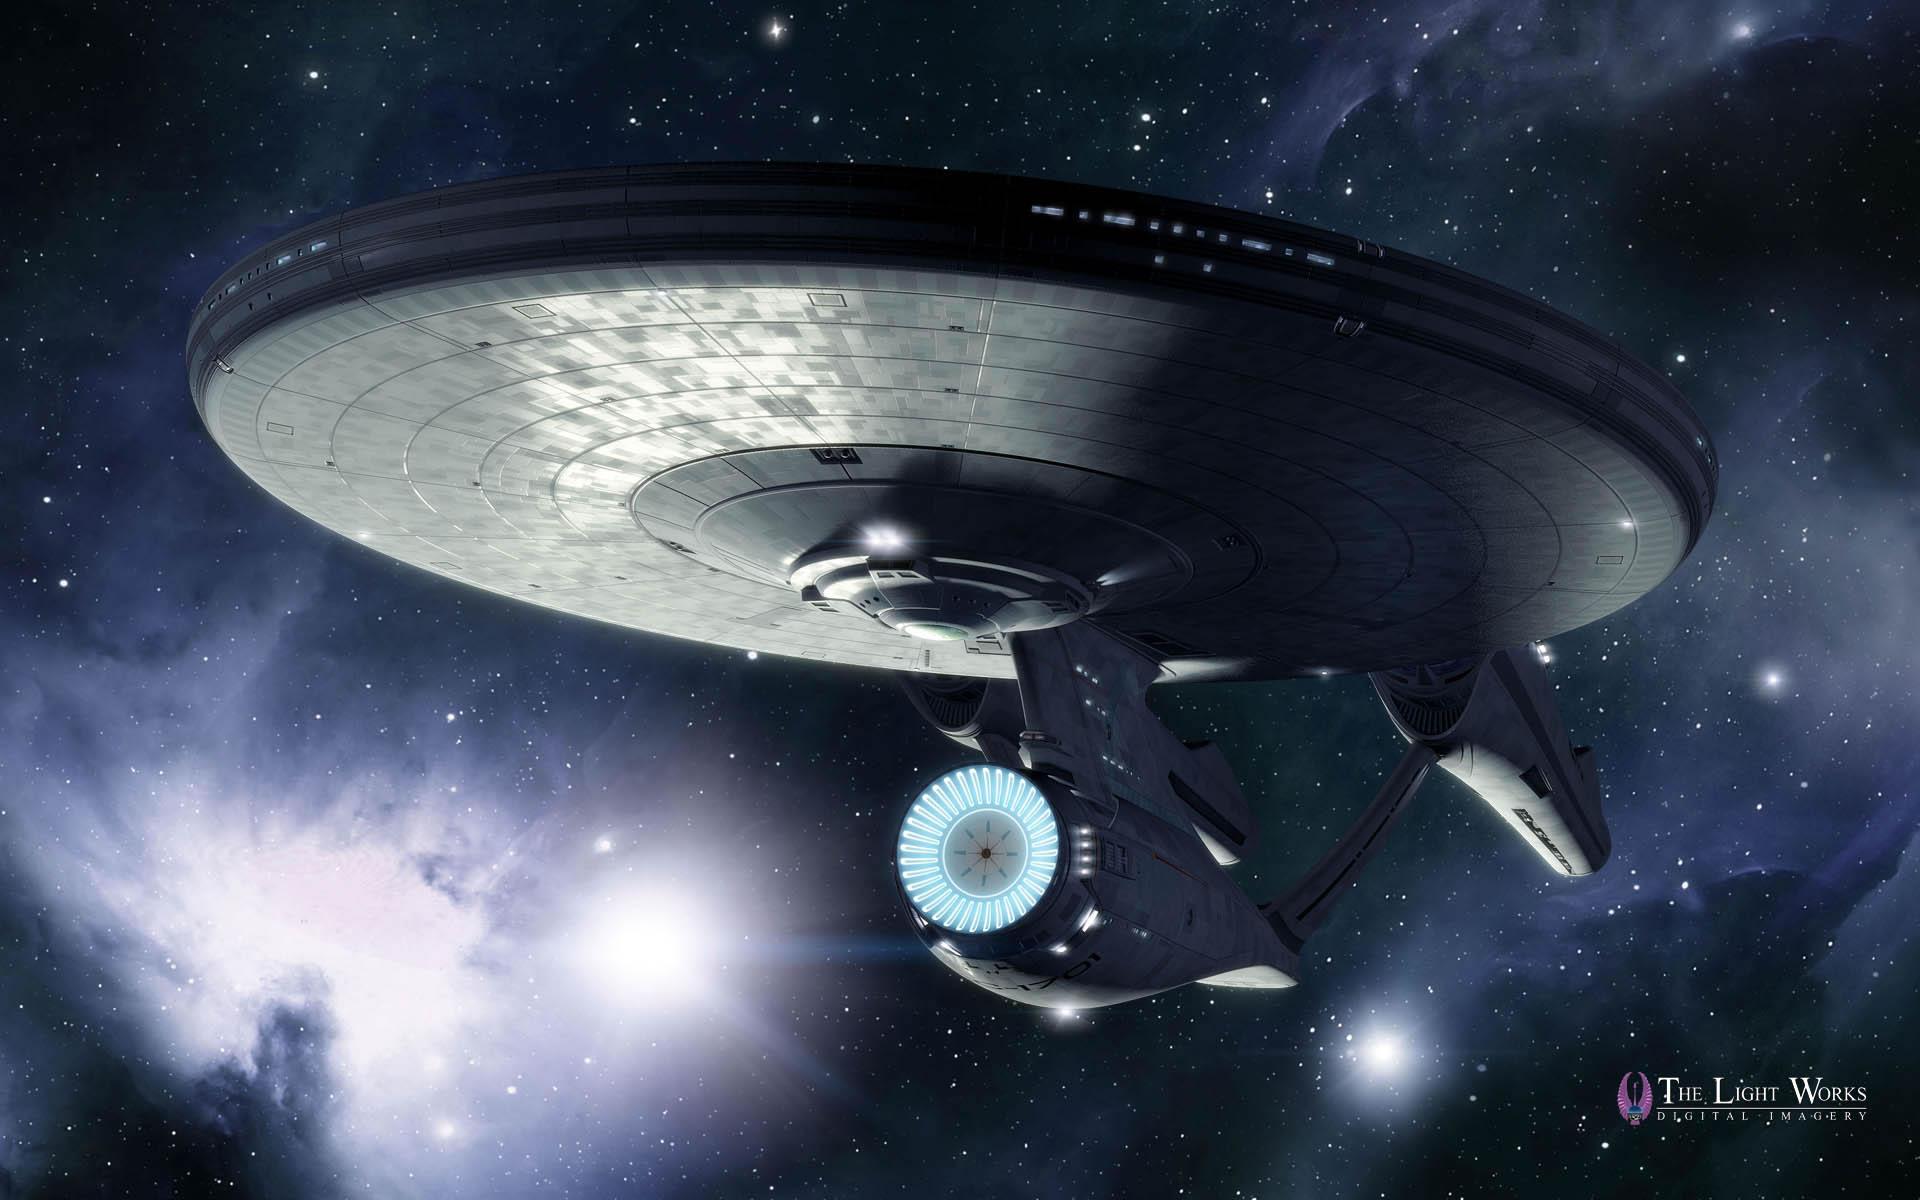 New Star Trek HD Wallpaper ImageBankbiz 1920x1200